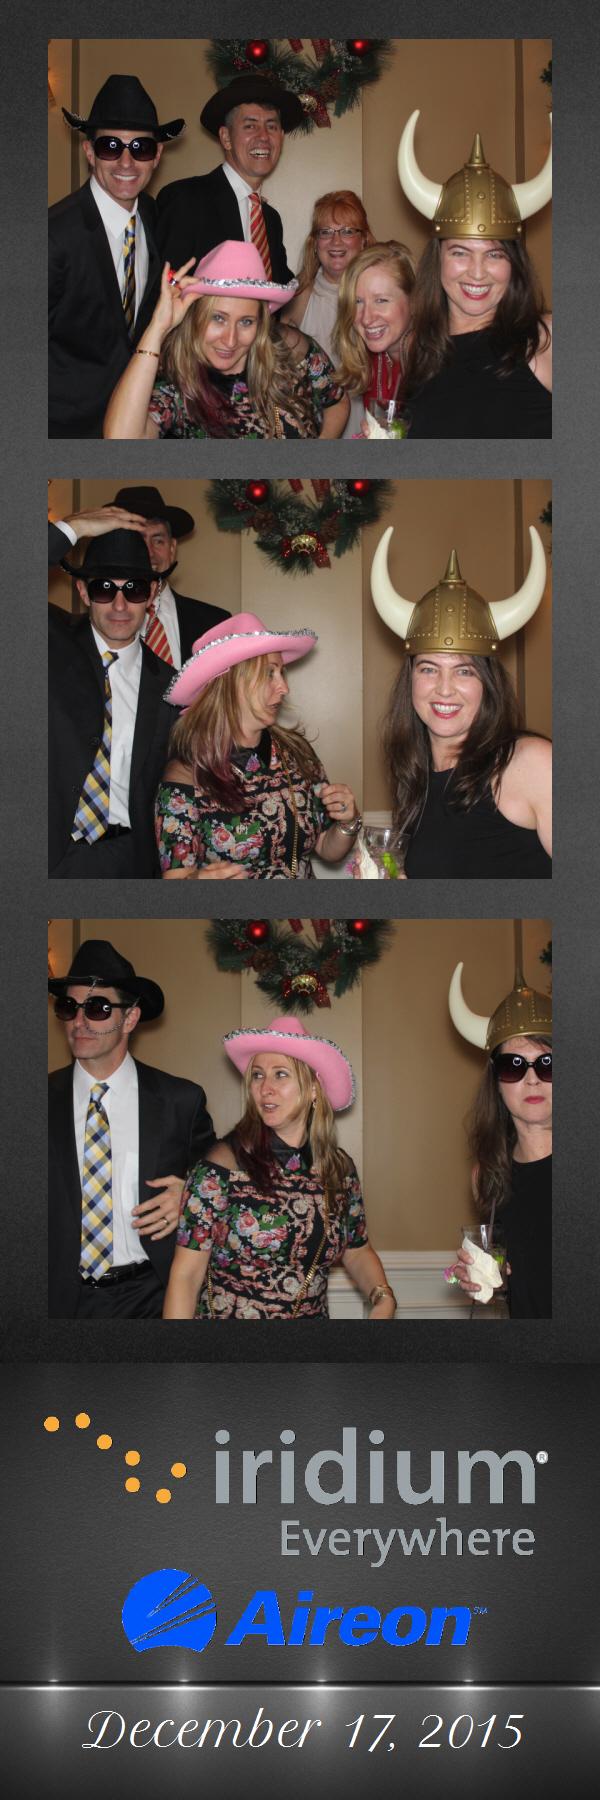 Guest House Events Photo Booth Iridium (31).jpg